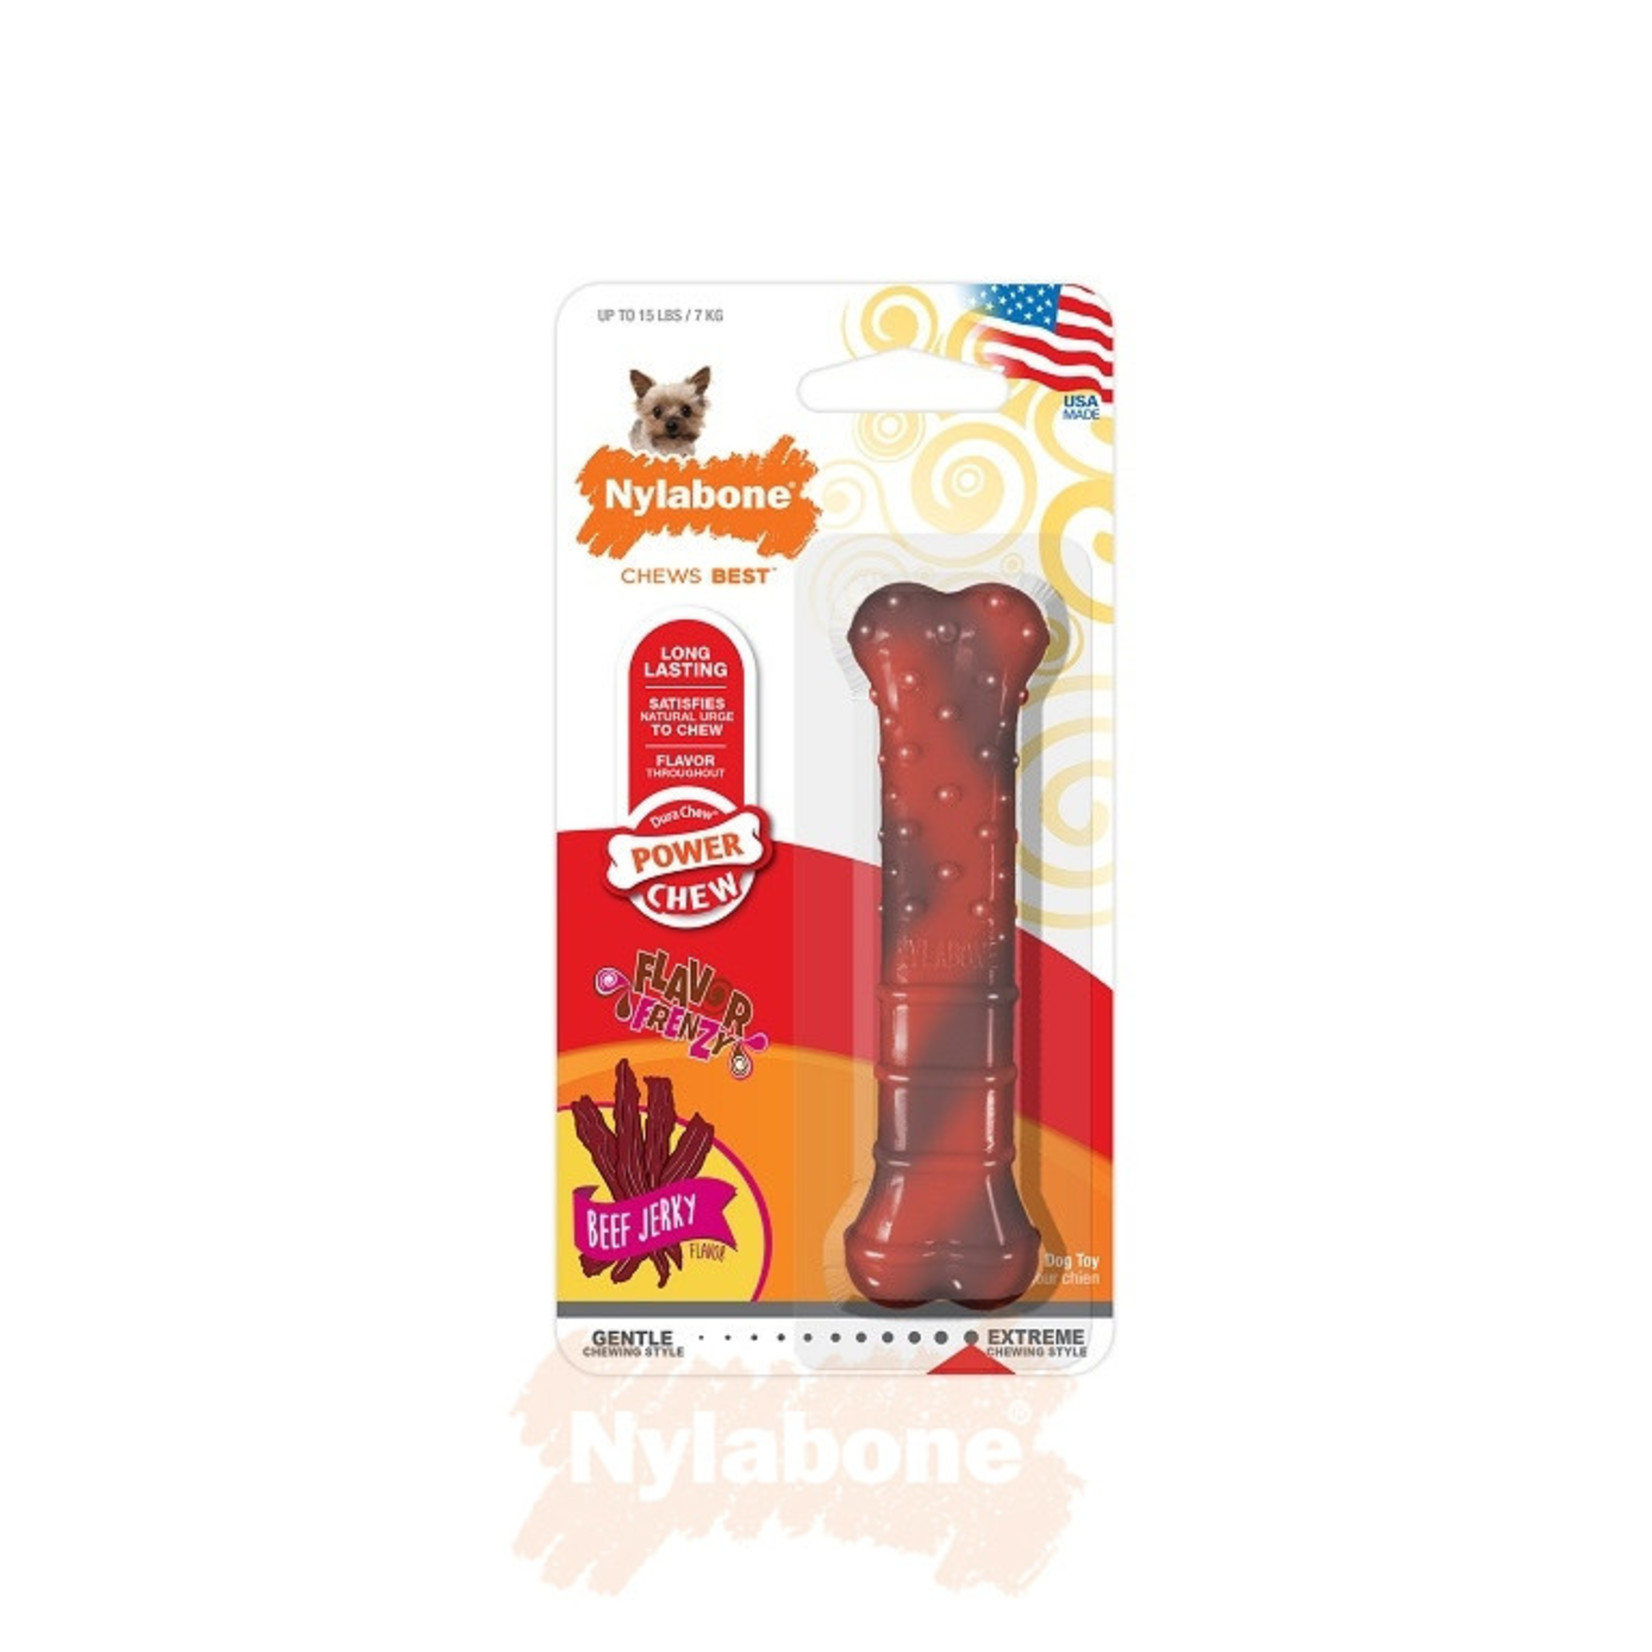 Nylabone Dura Chew Textured Beef Jerky Dog Chew Toy